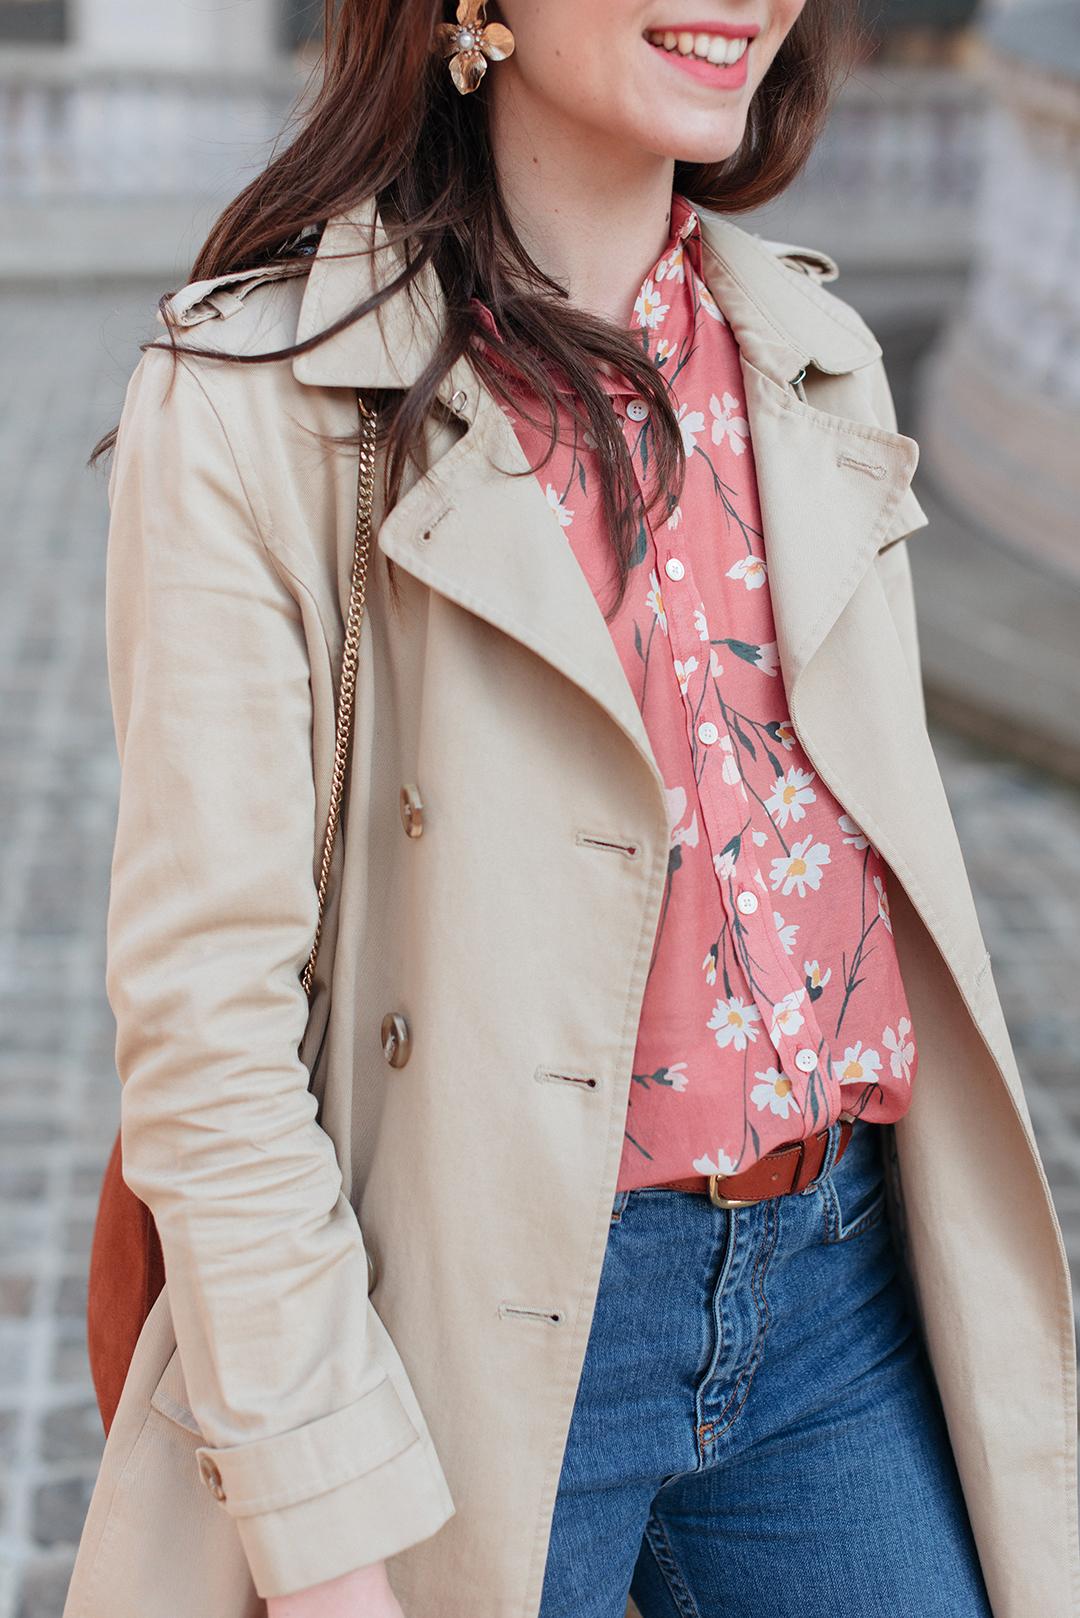 Blog-mode-And-The-City-Lifestyle-Looks-Chemisier-Fleurs-Palais-Garnier-7